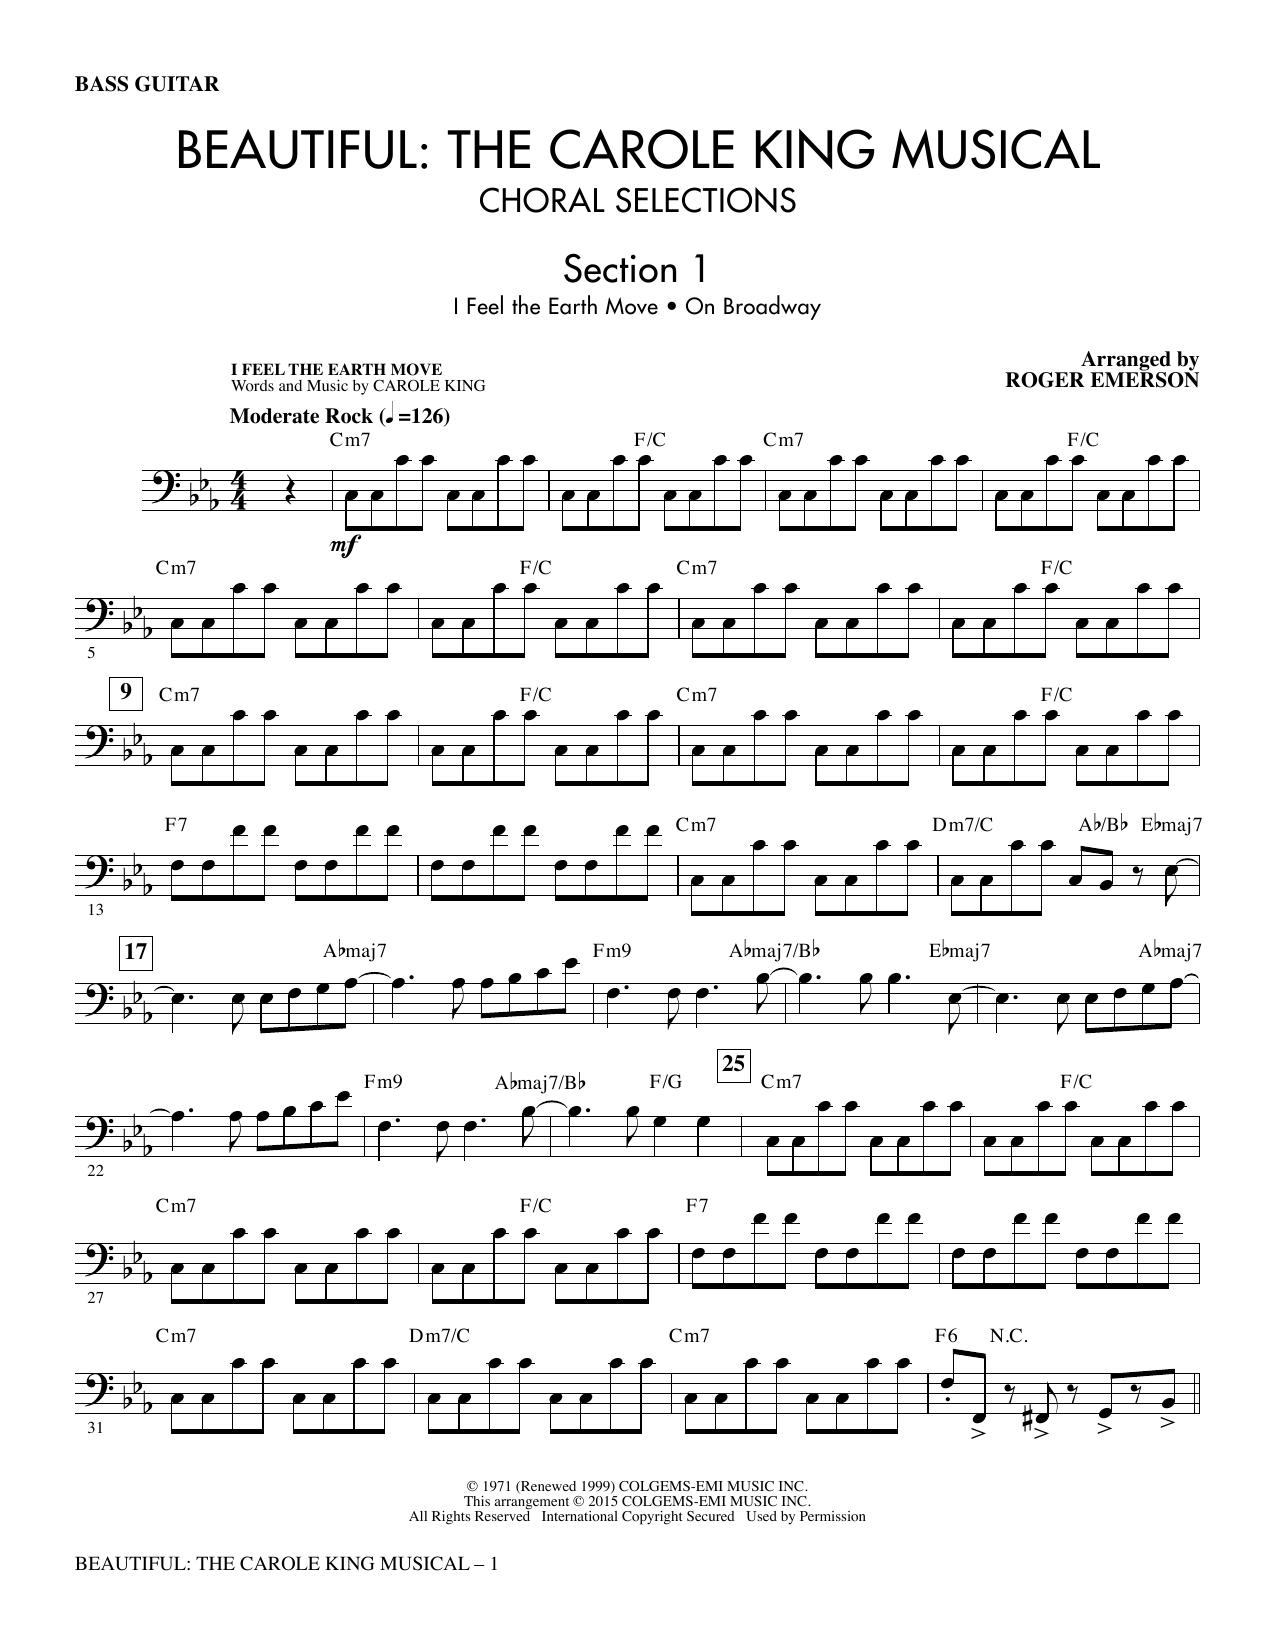 Beautiful: The Carole King Musical (Choral Selections) - Bass sheet music